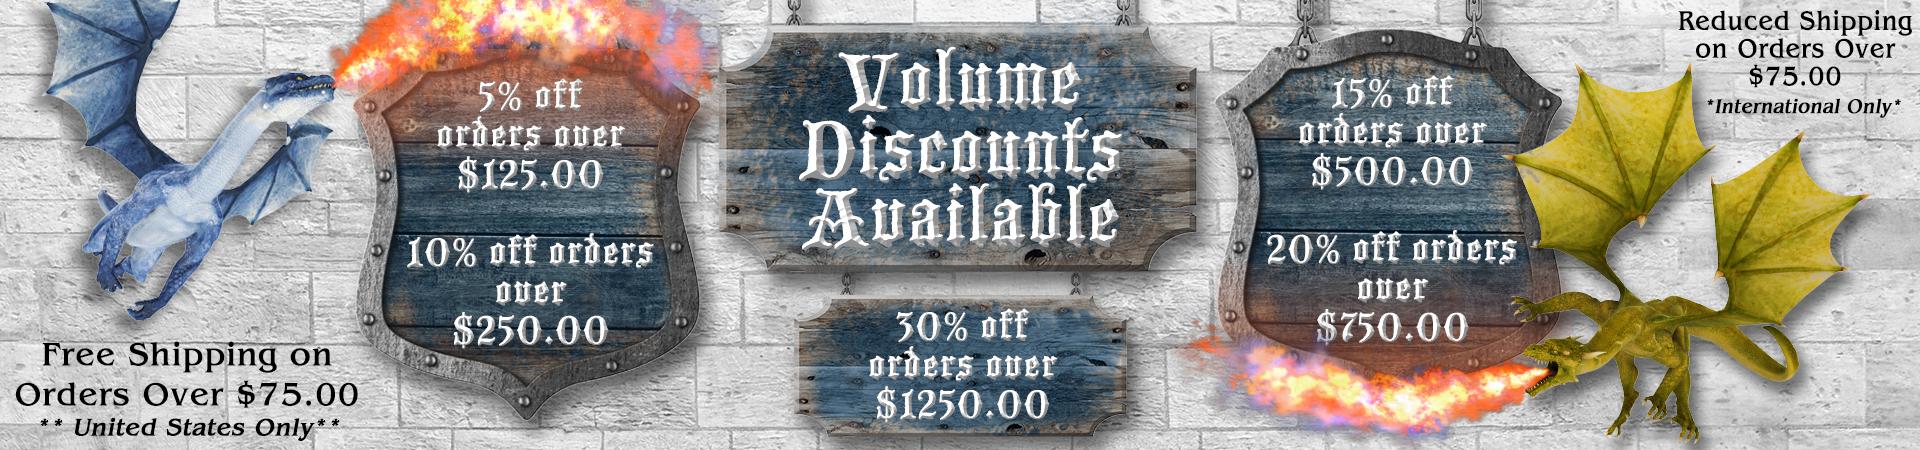 Weave Got Maille Volume Discount's